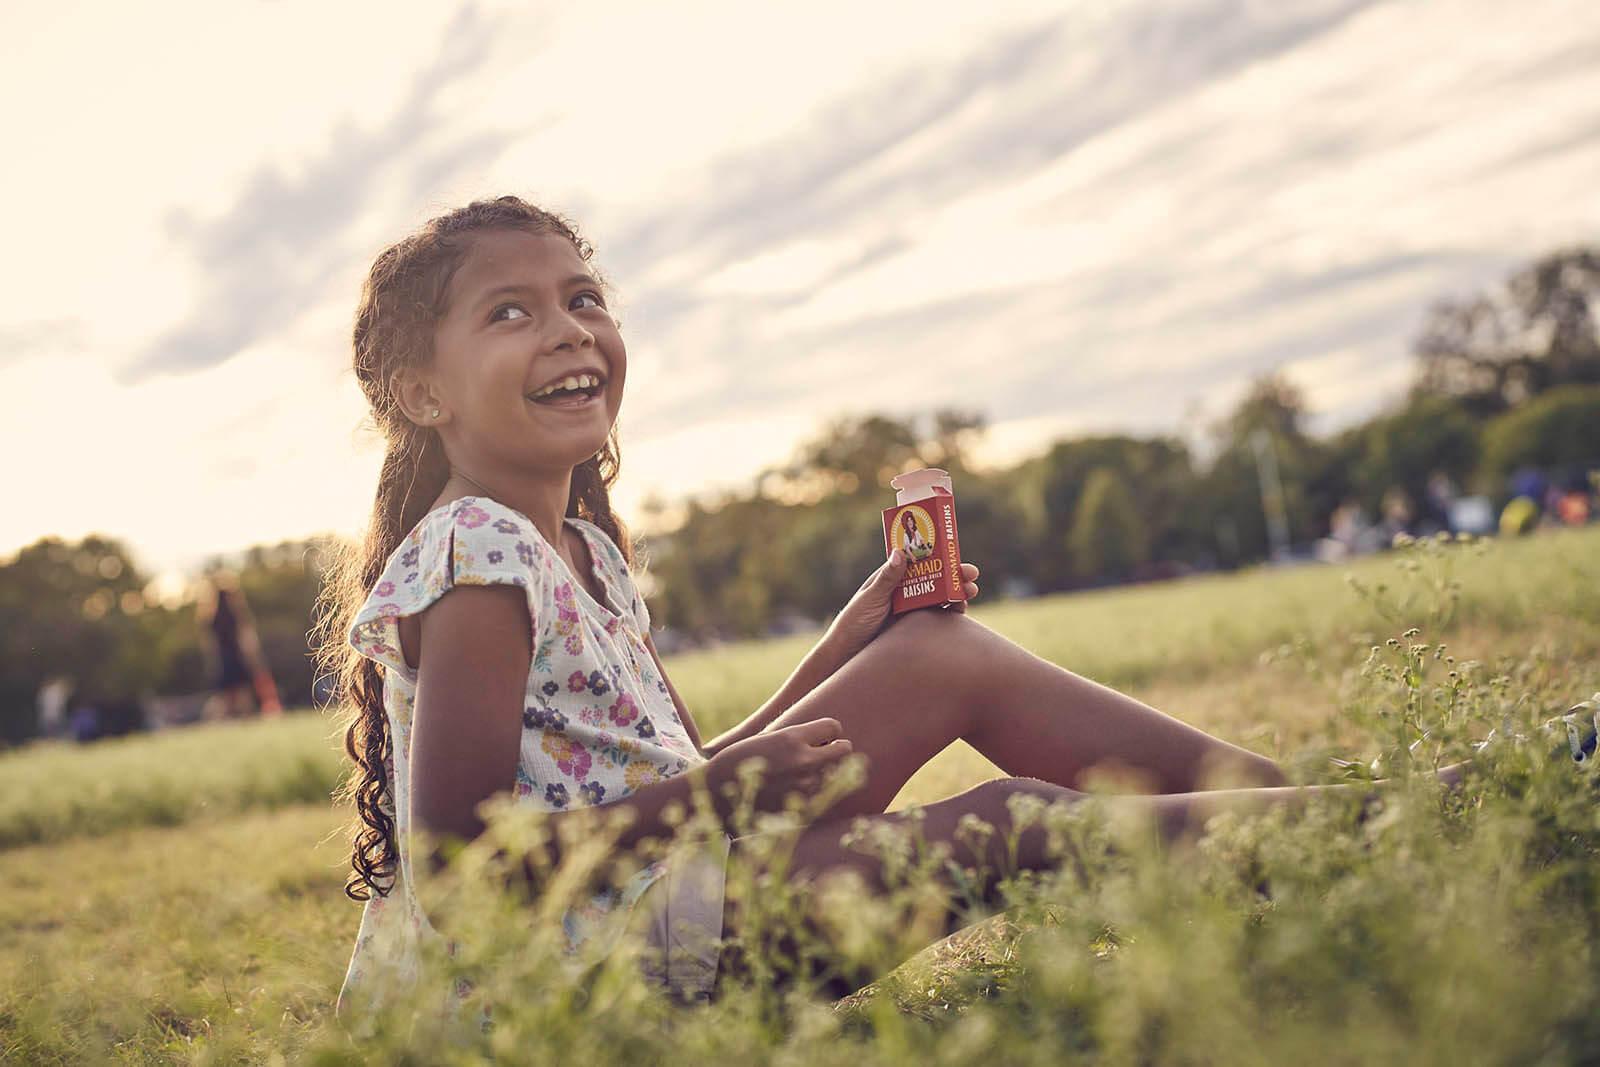 Child sitting in a field eating Sun-Maid raisins